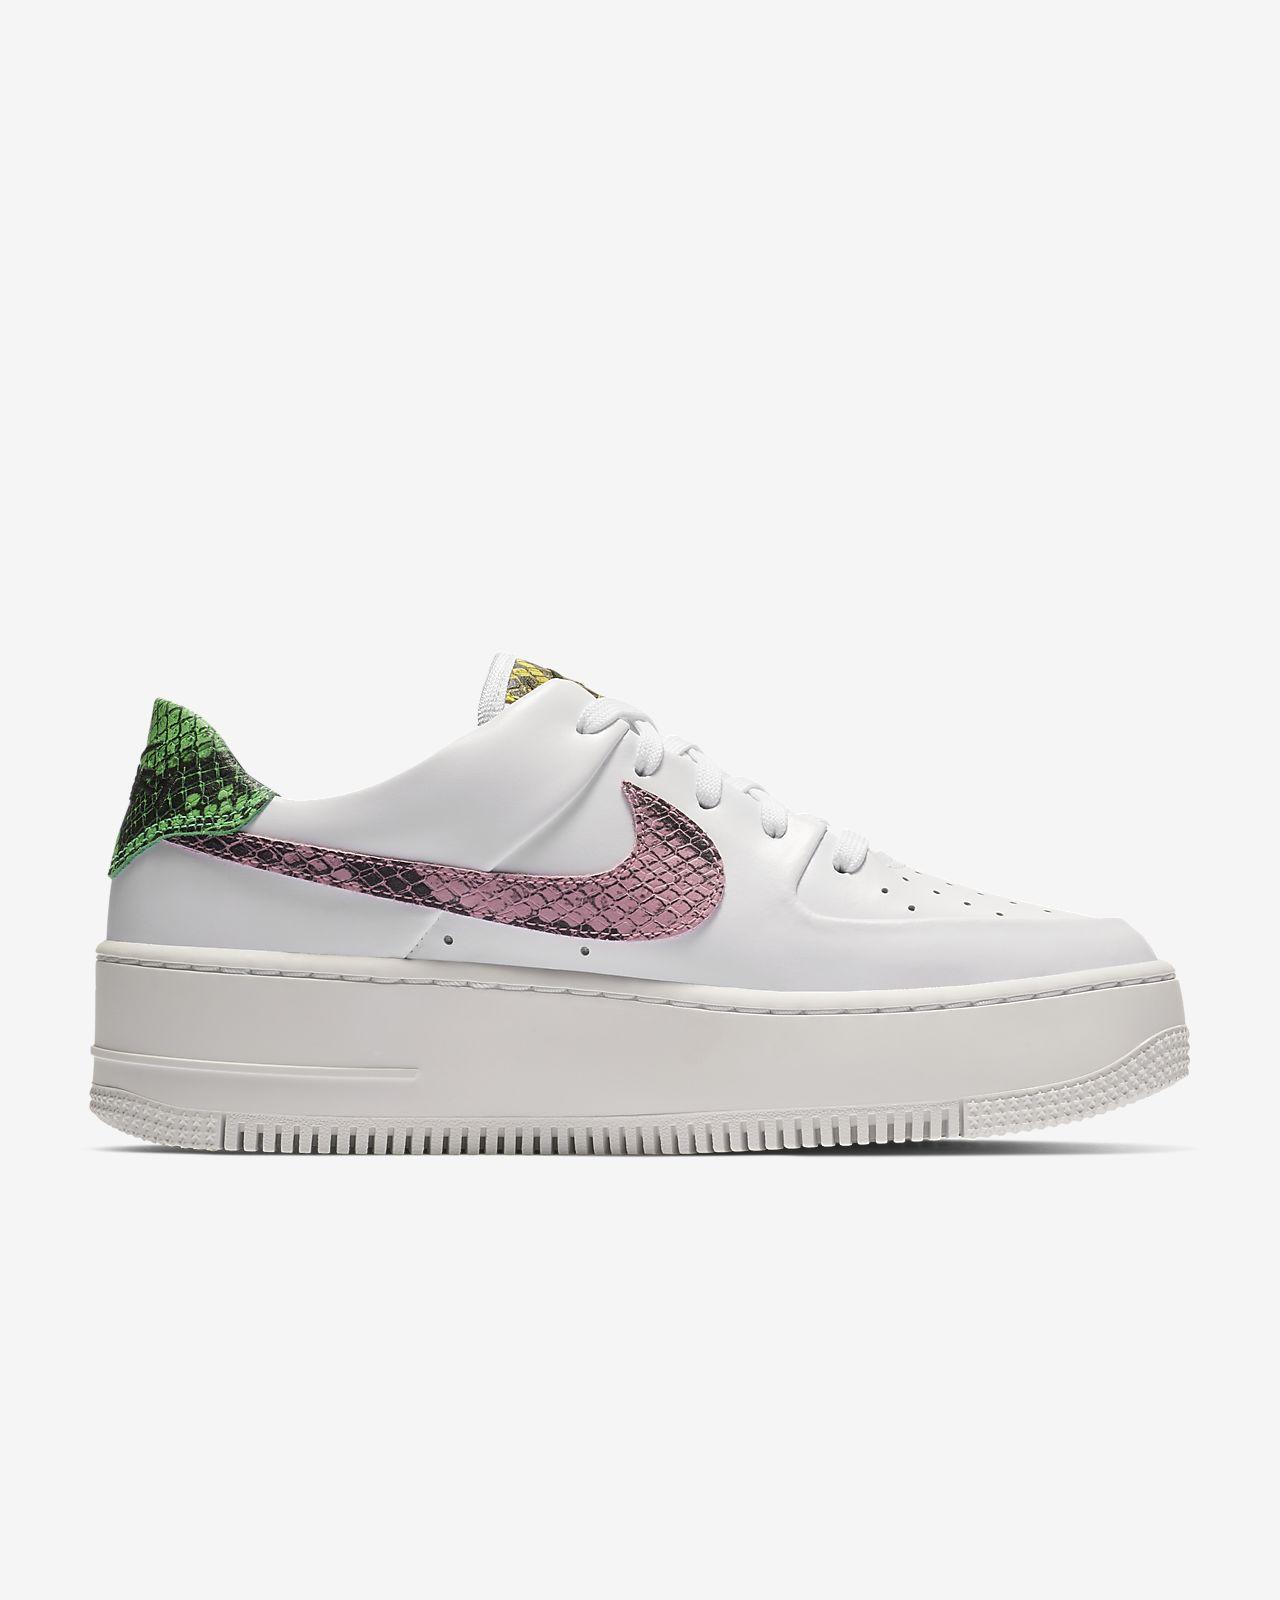 Scarpa Nike Air Force 1 Sage Low Donna Cream Nike grigio Plateau